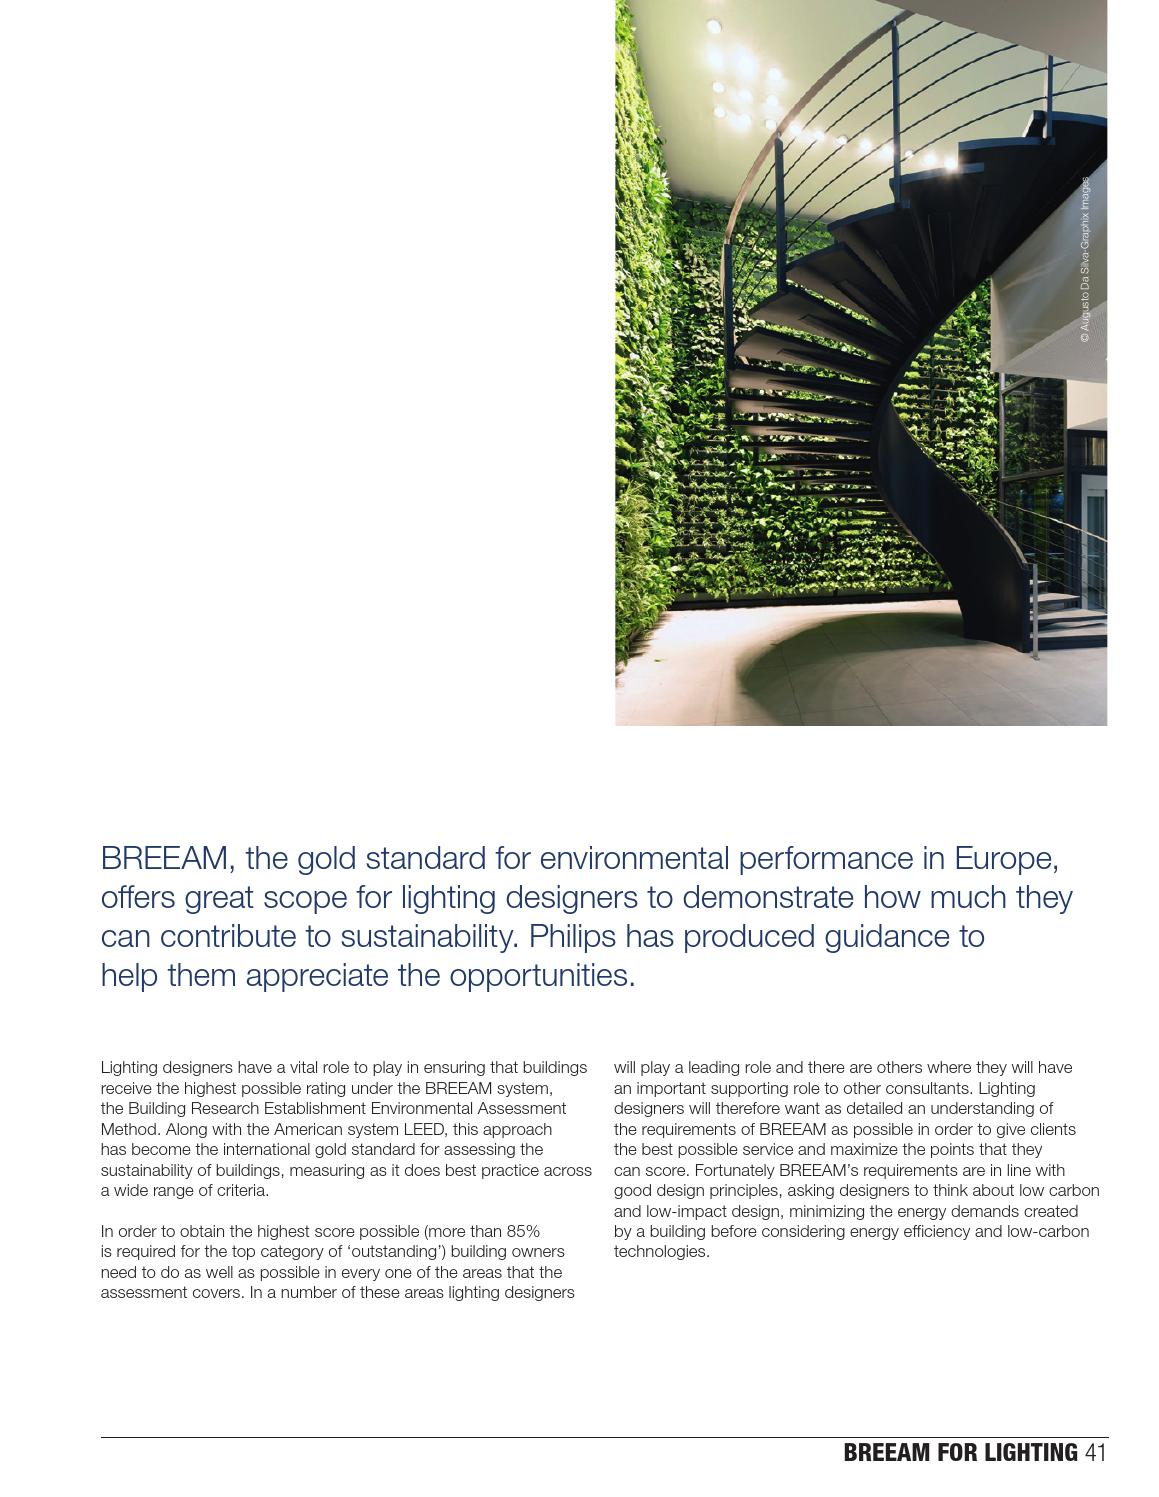 Luminous 15 - Comfort in Public Spaces by Luminous u2013 International Lighting Magazine - issuu  sc 1 st  Issuu & Luminous 15 - Comfort in Public Spaces by Luminous u2013 International ... azcodes.com